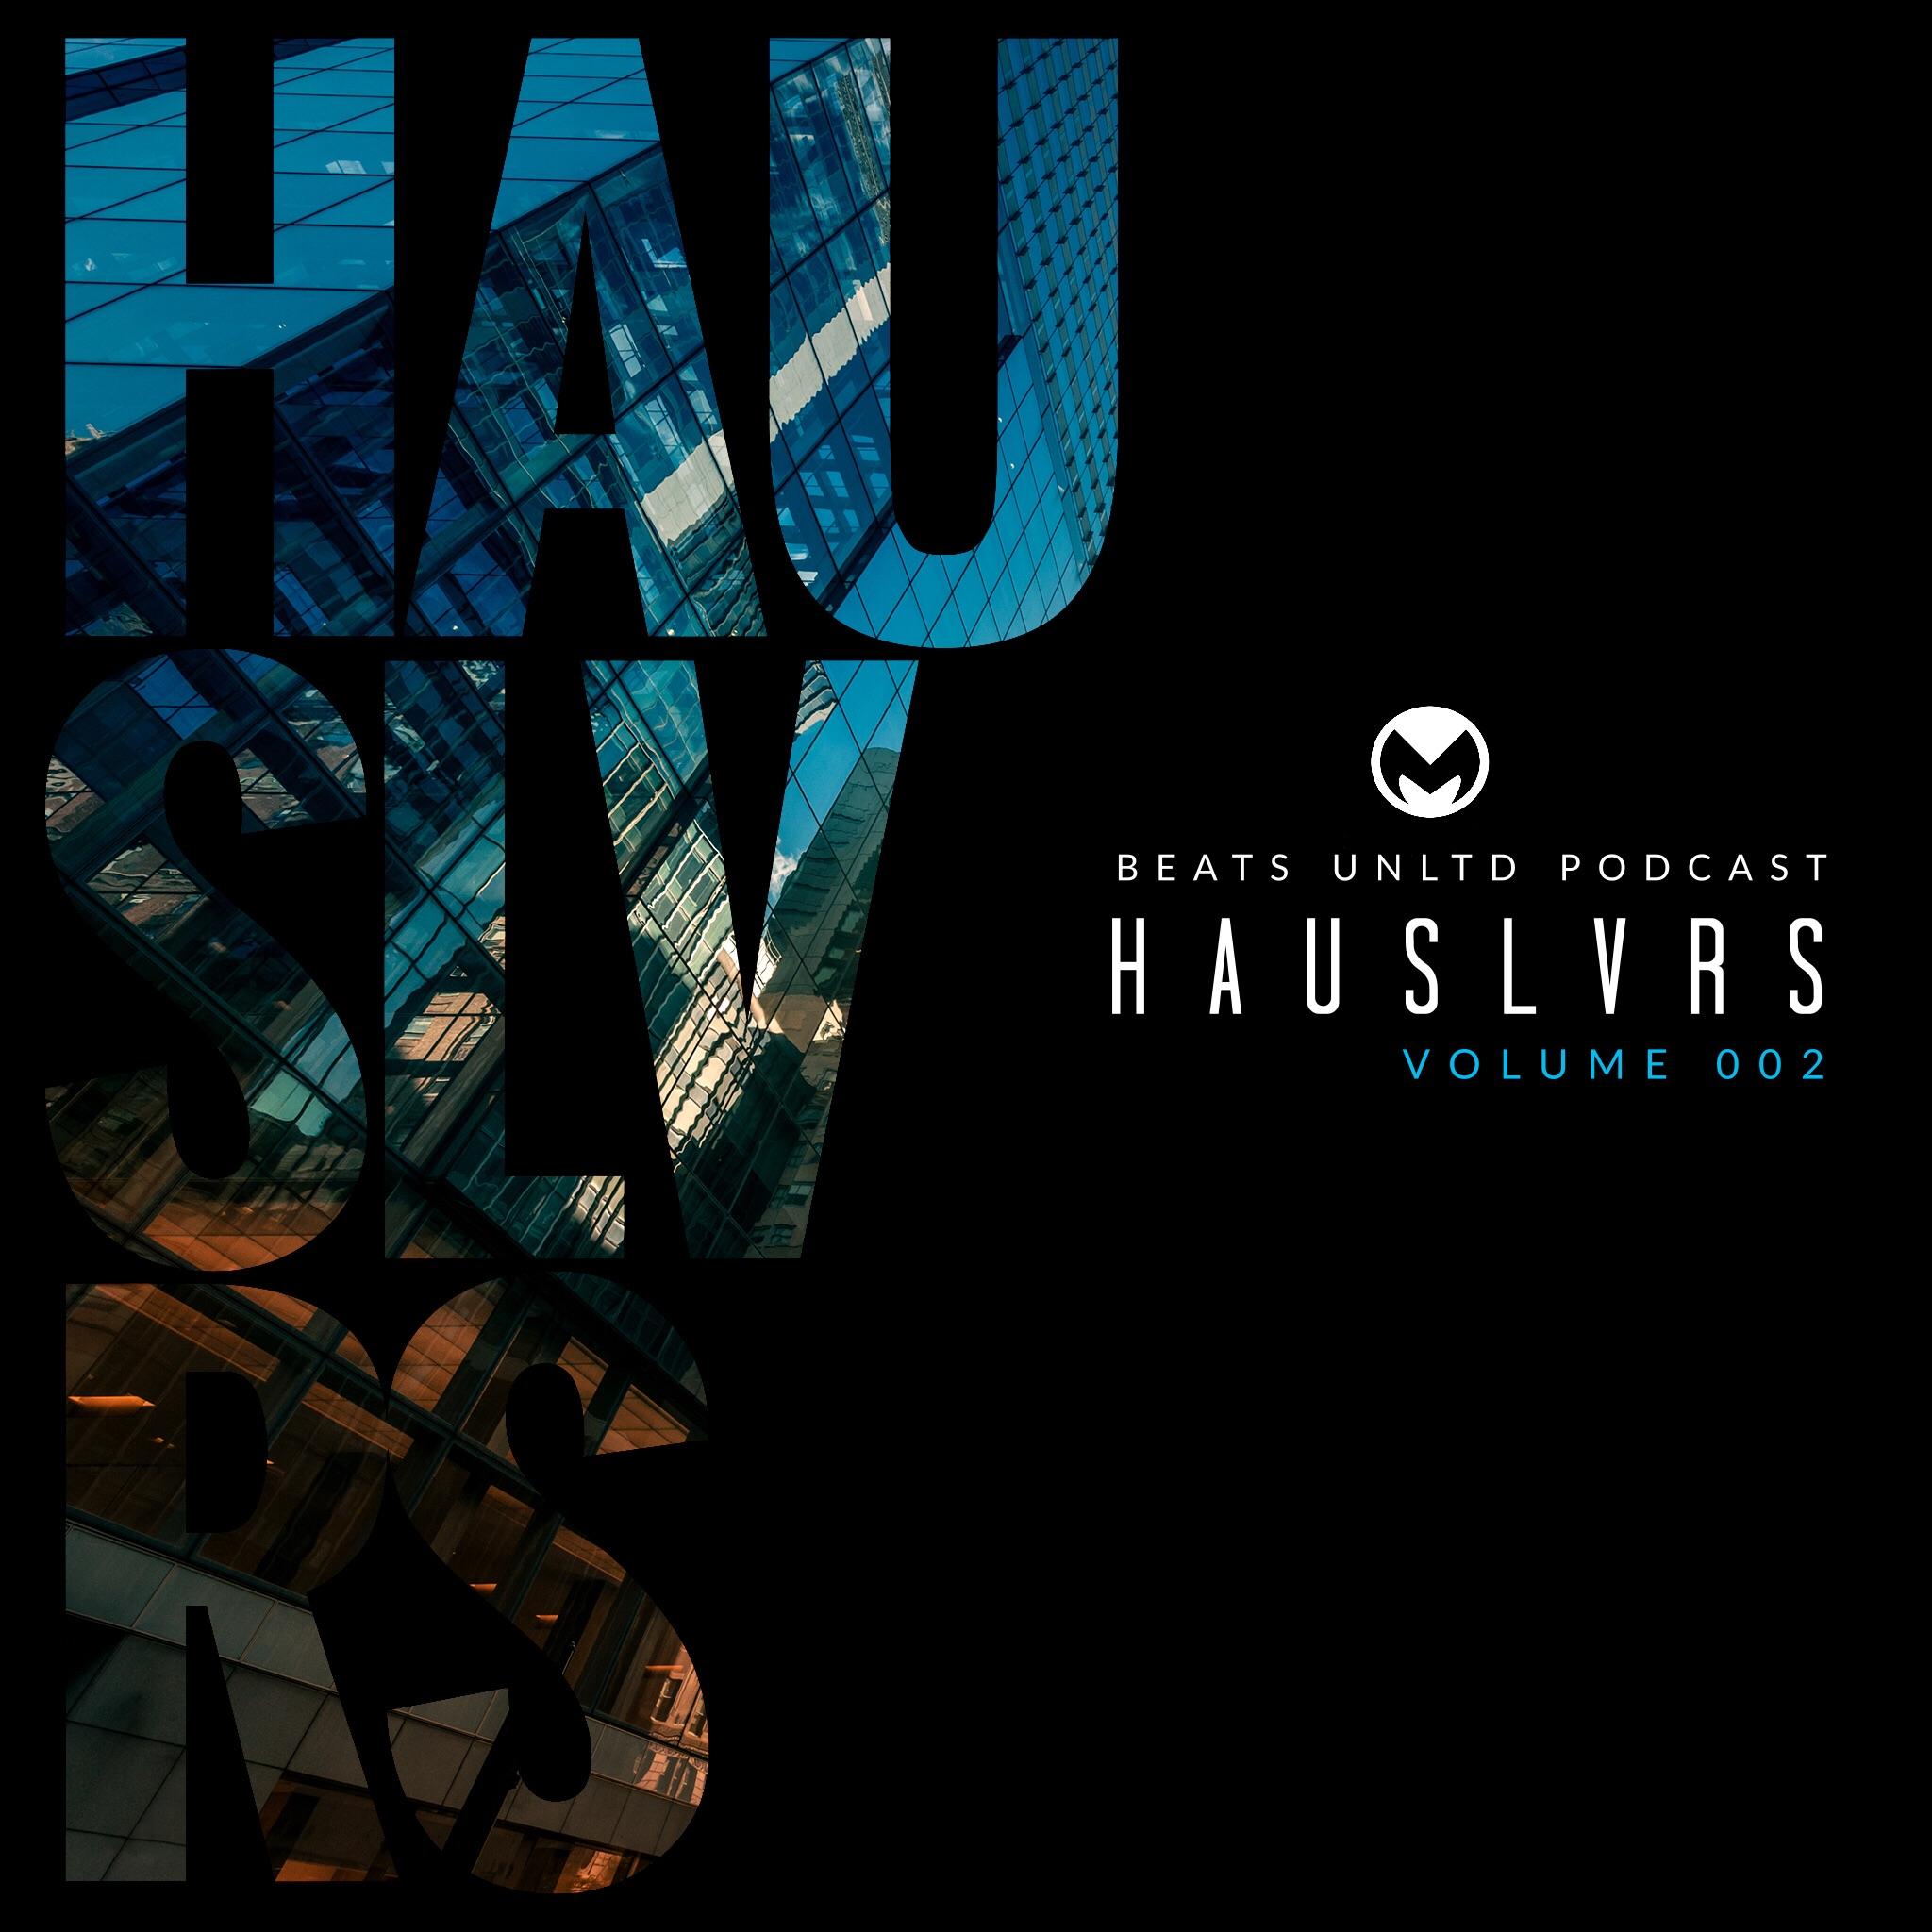 233 HausLvrs Volume 002